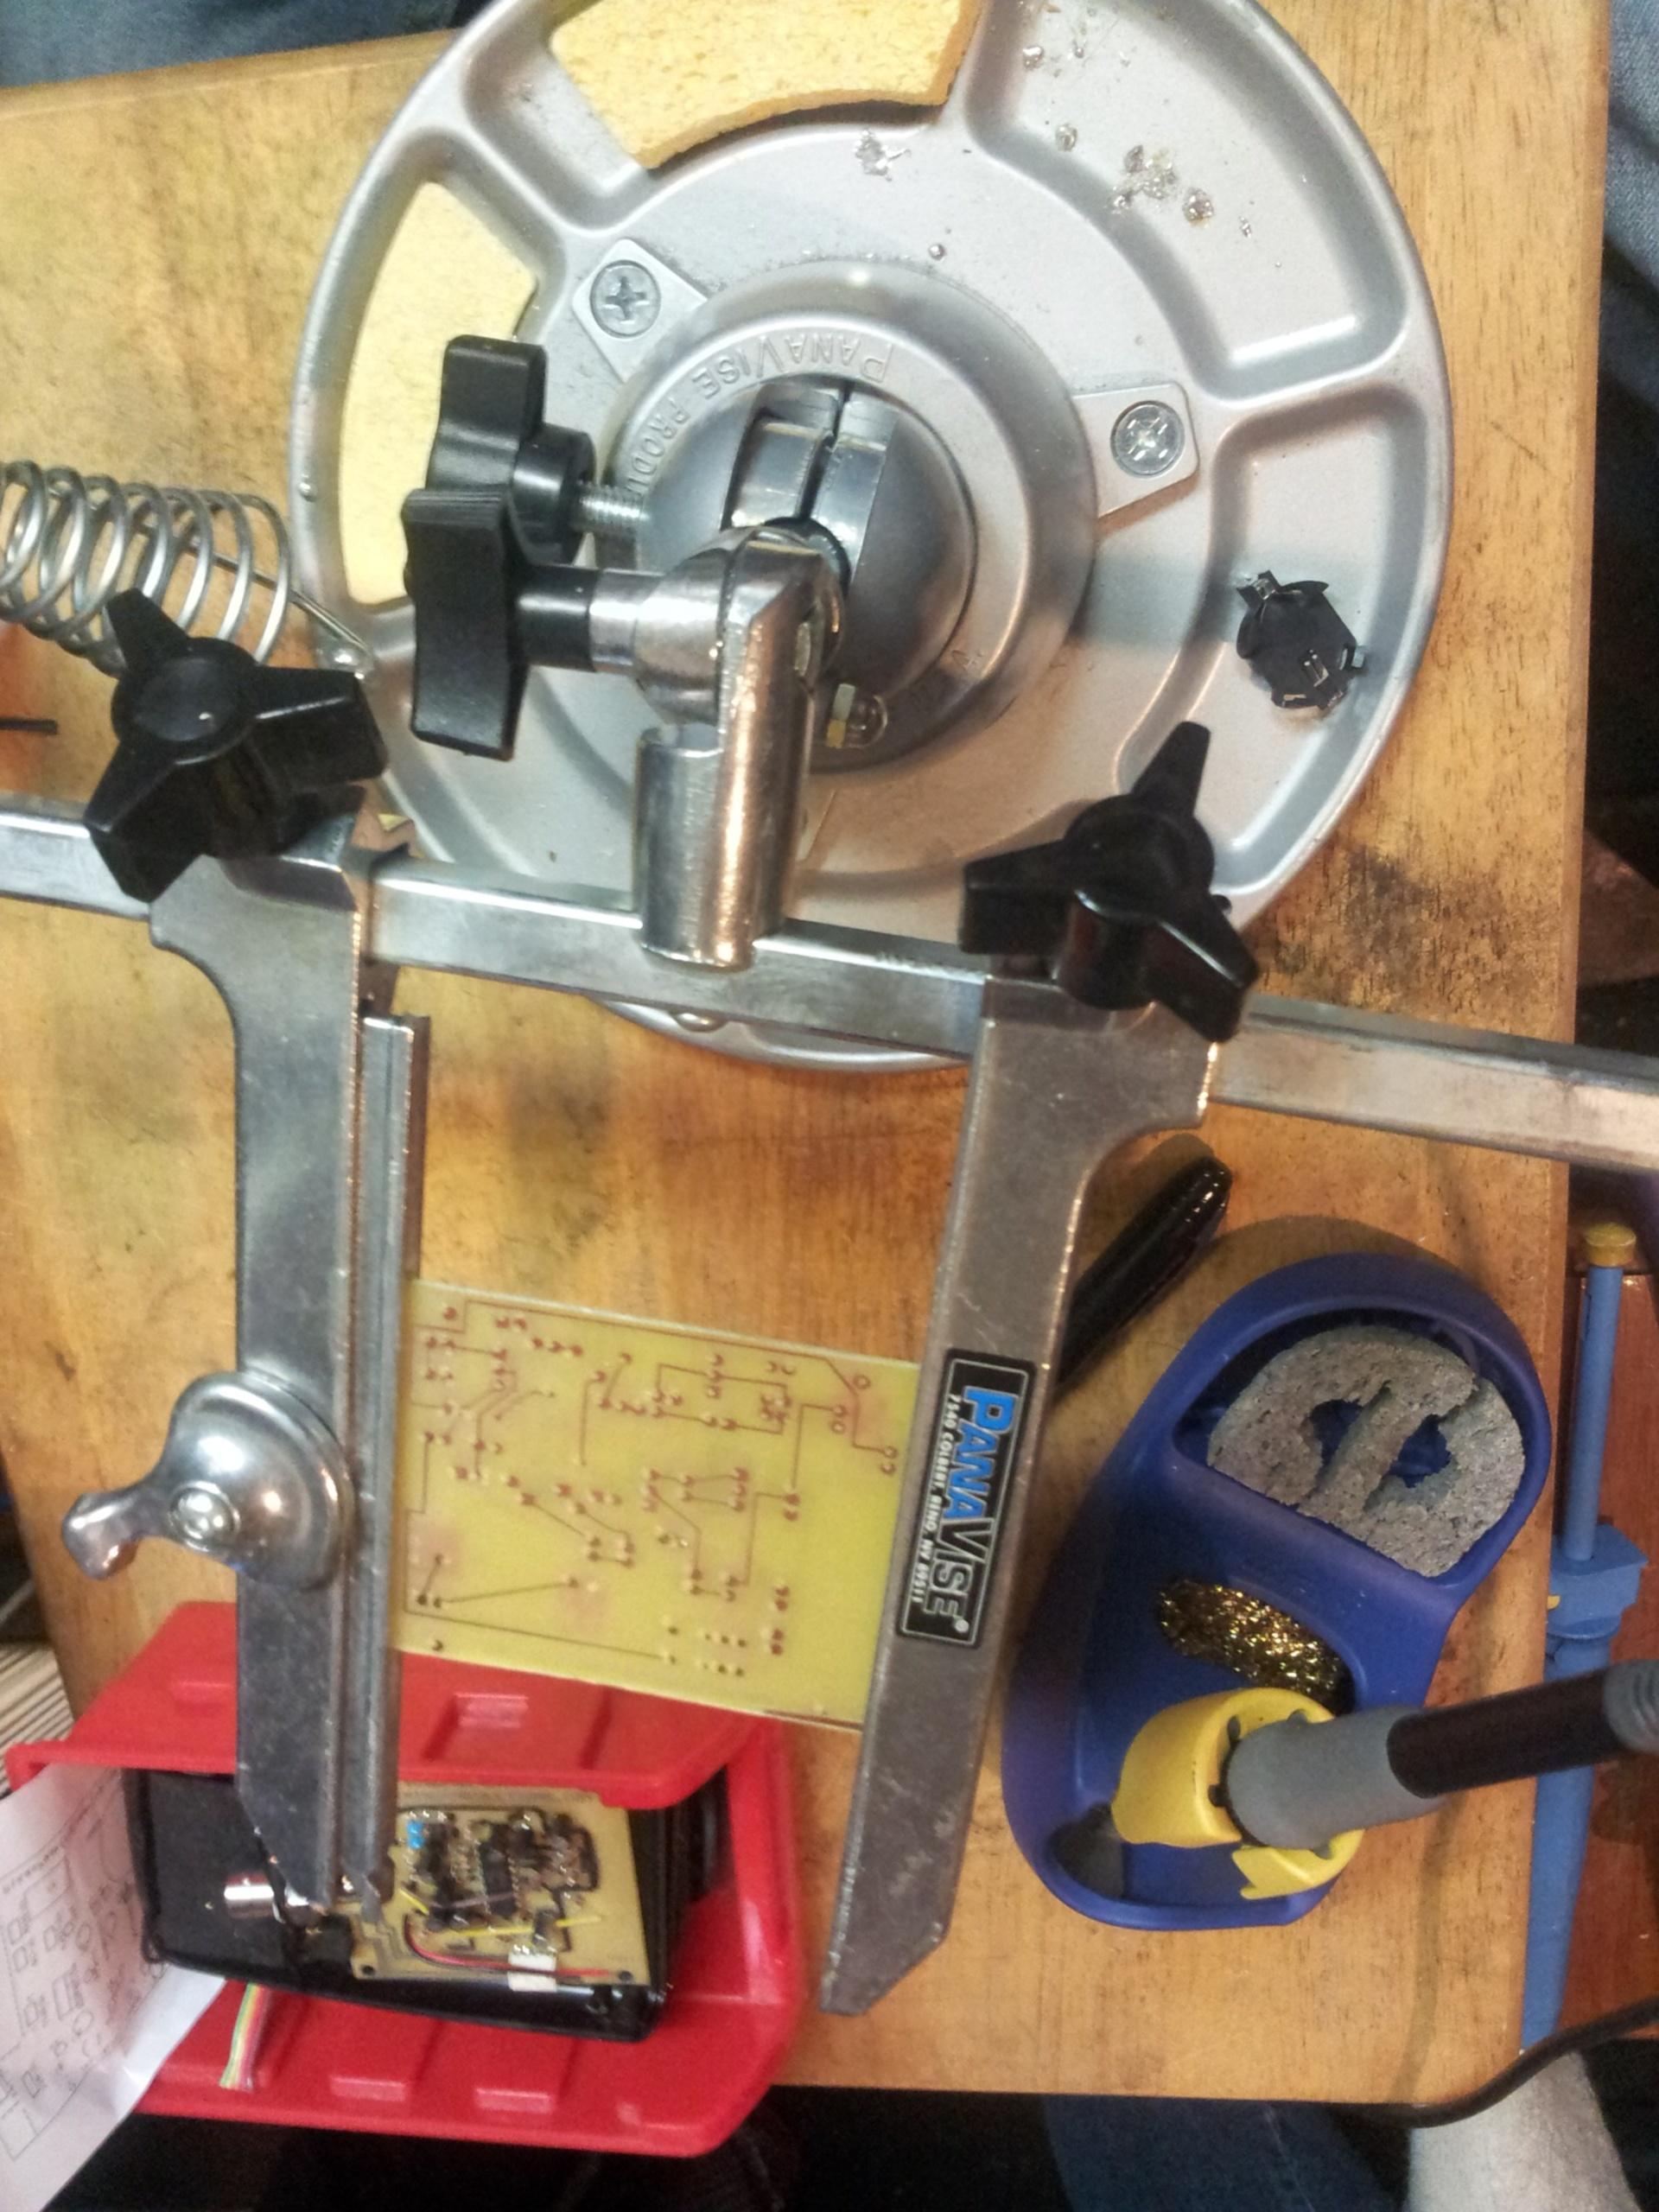 Electronics reworking soldering   gablagloire, design, equipment, technology